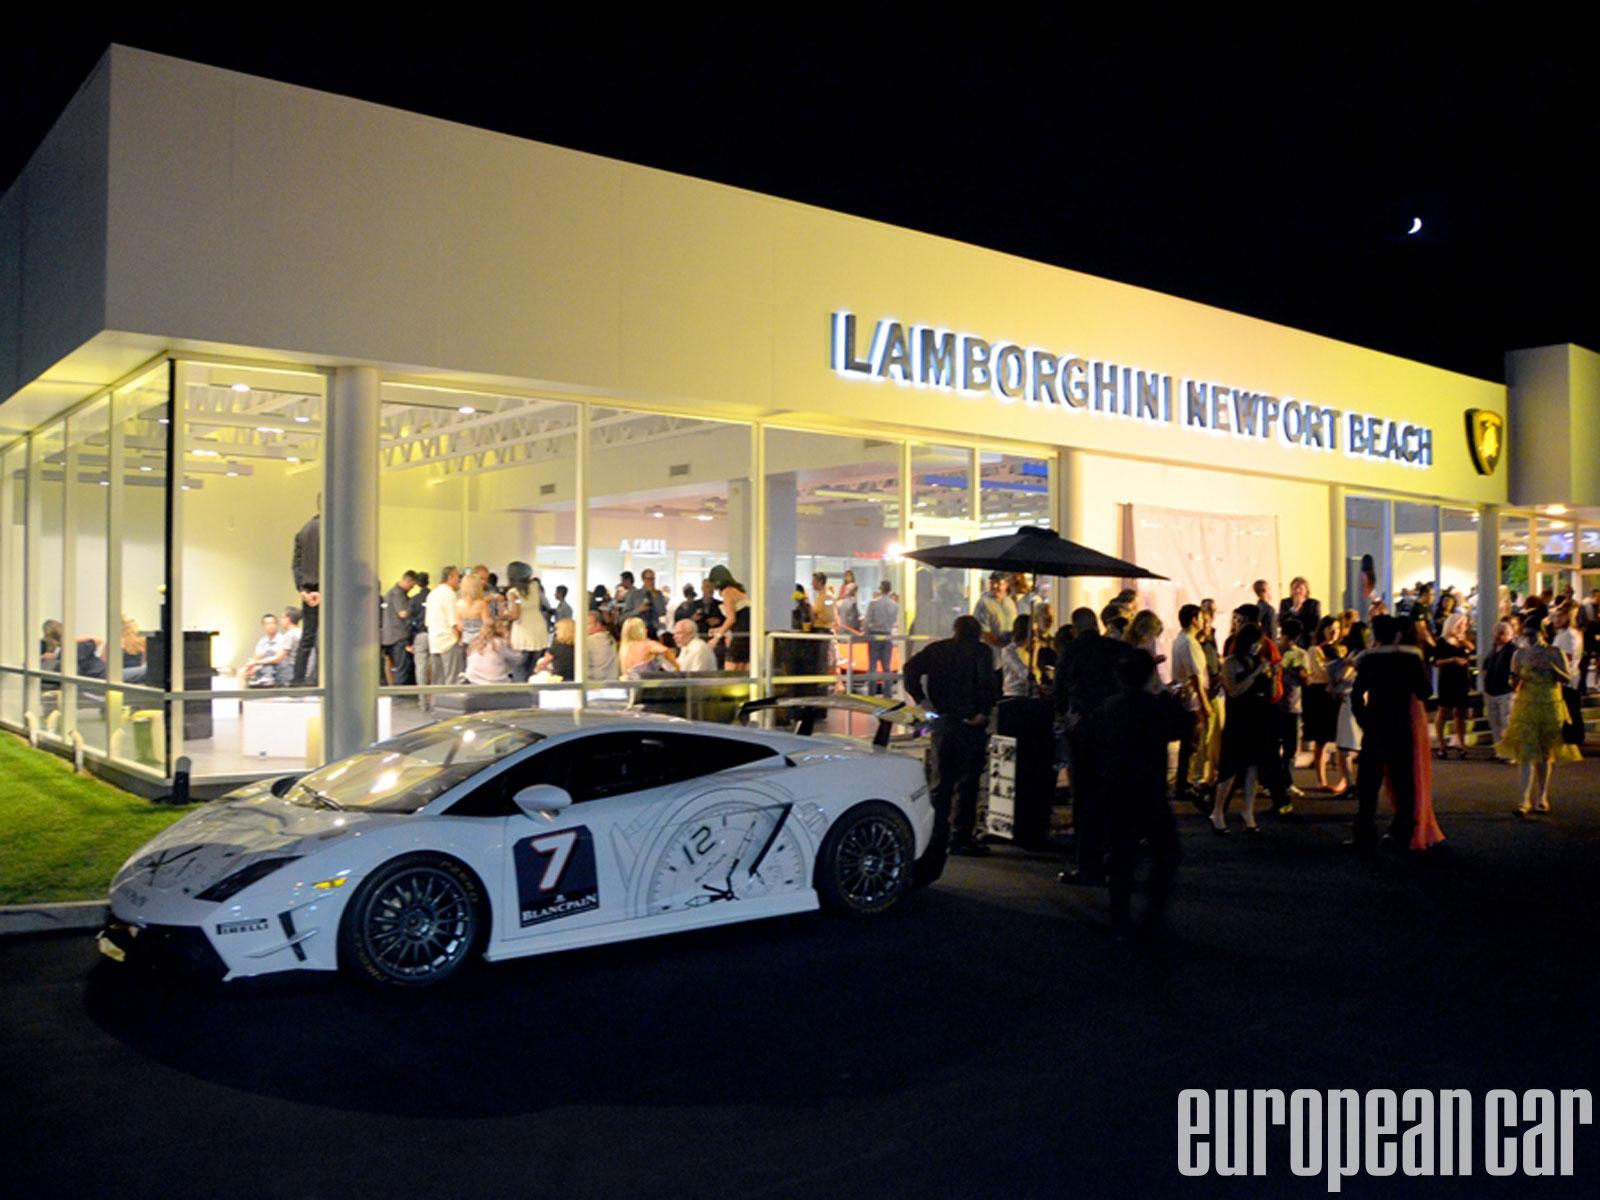 Lamborghini Newport Beach Grand Opening Web Exclusive European Car Magazine